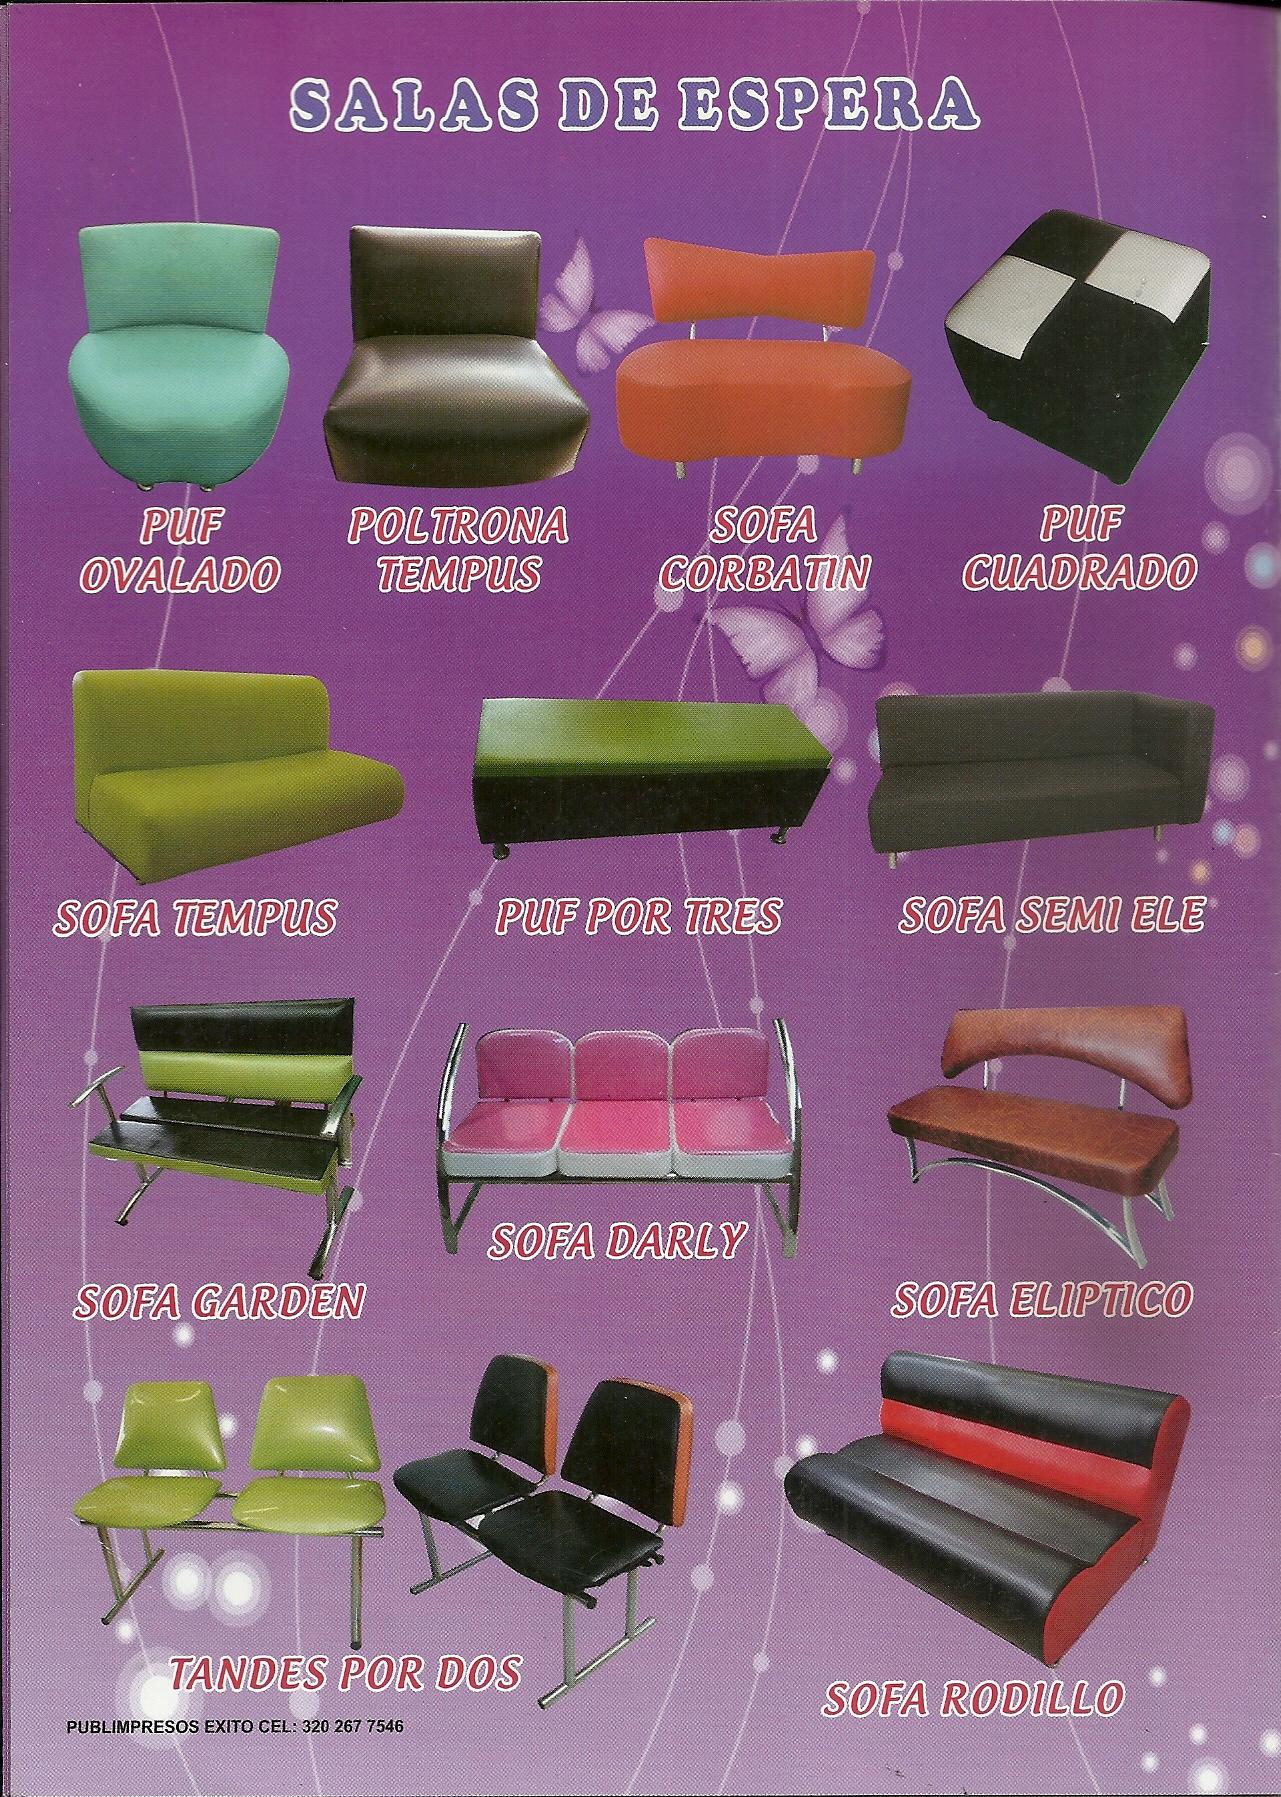 Muebles Bogota Muebles Oficina Sillas Archivadores Peluqueria # Muebles Peluqueria Bogota